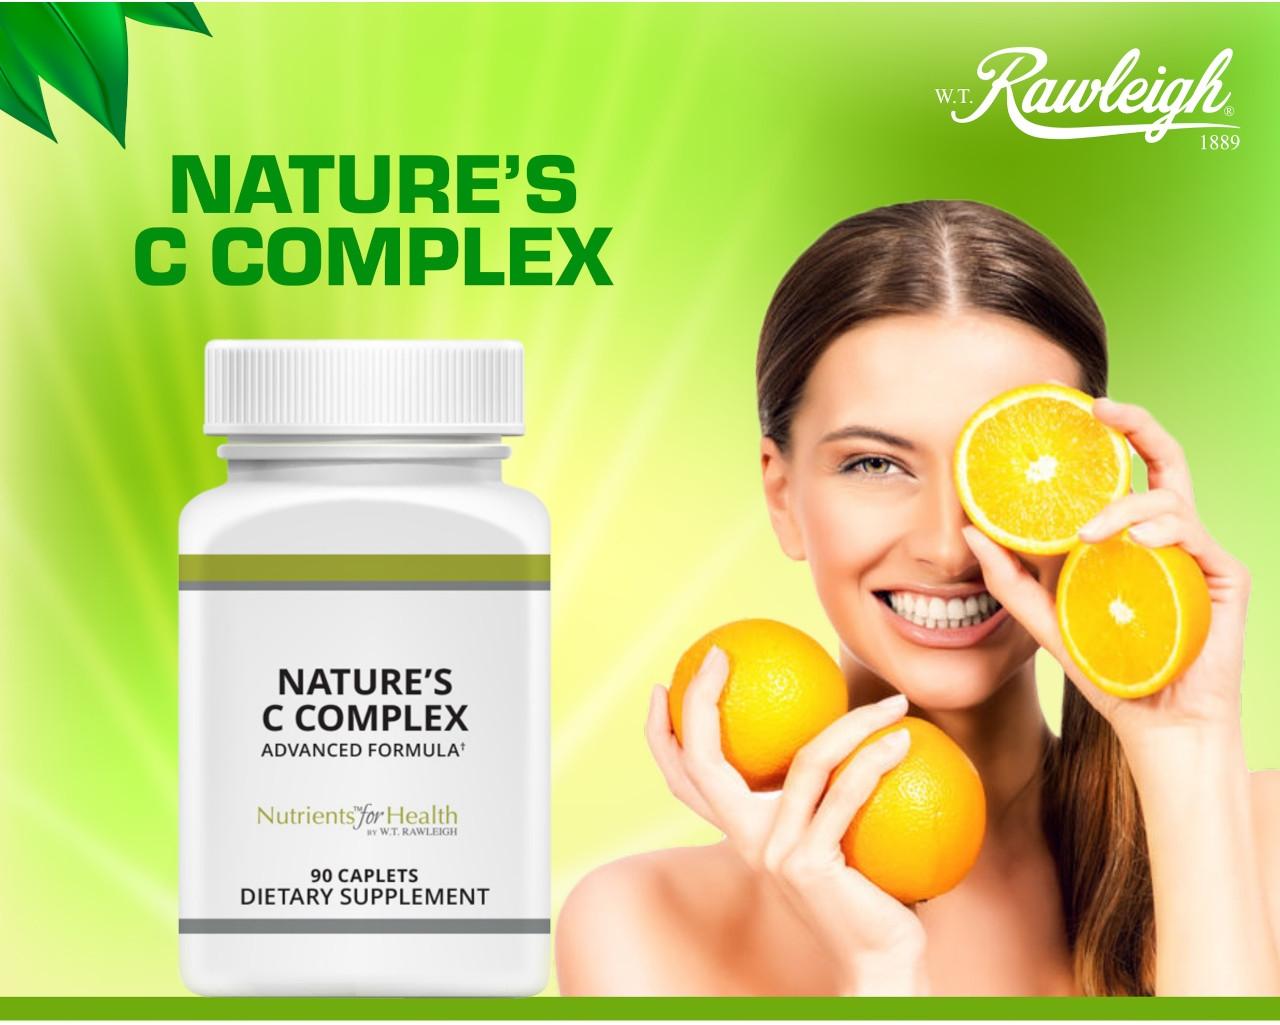 Save 10% on Nature's Vitamin C Complex!